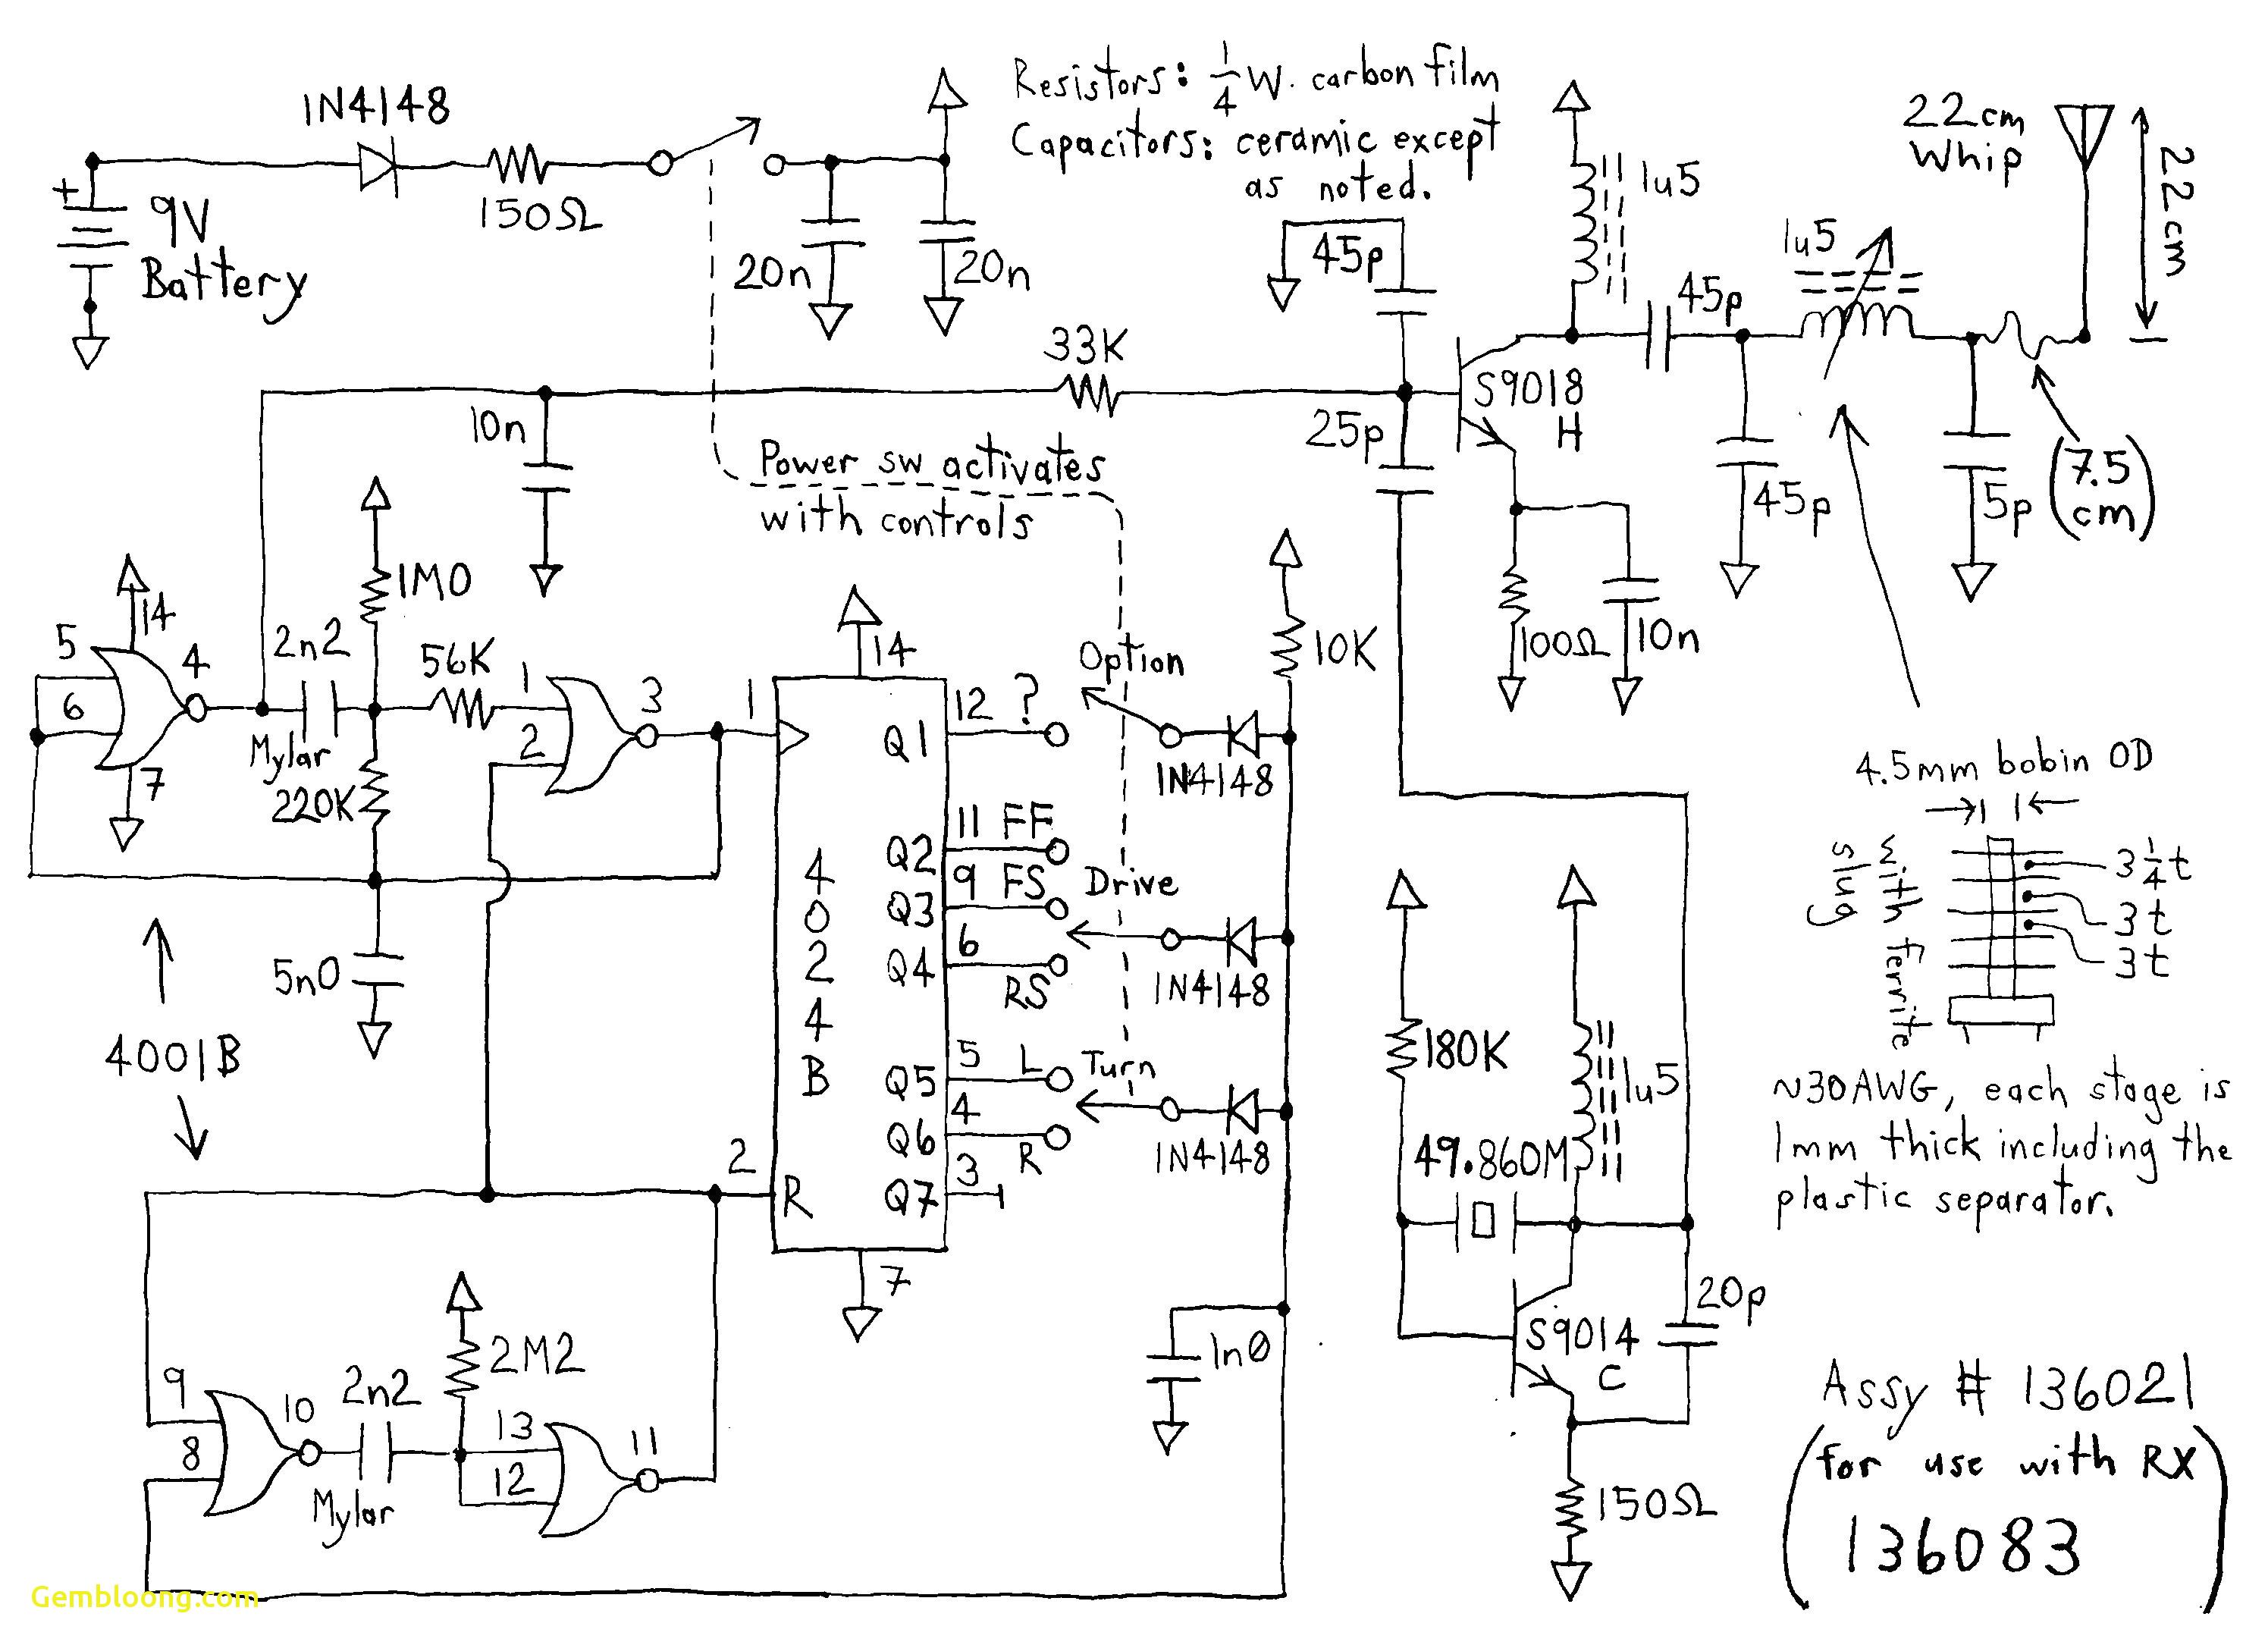 1999 Chevy Cavalier Starter Wiring Diagram 1999 Chevy Cavalier Stereo Wiring Diagram Wiring Diagram Center